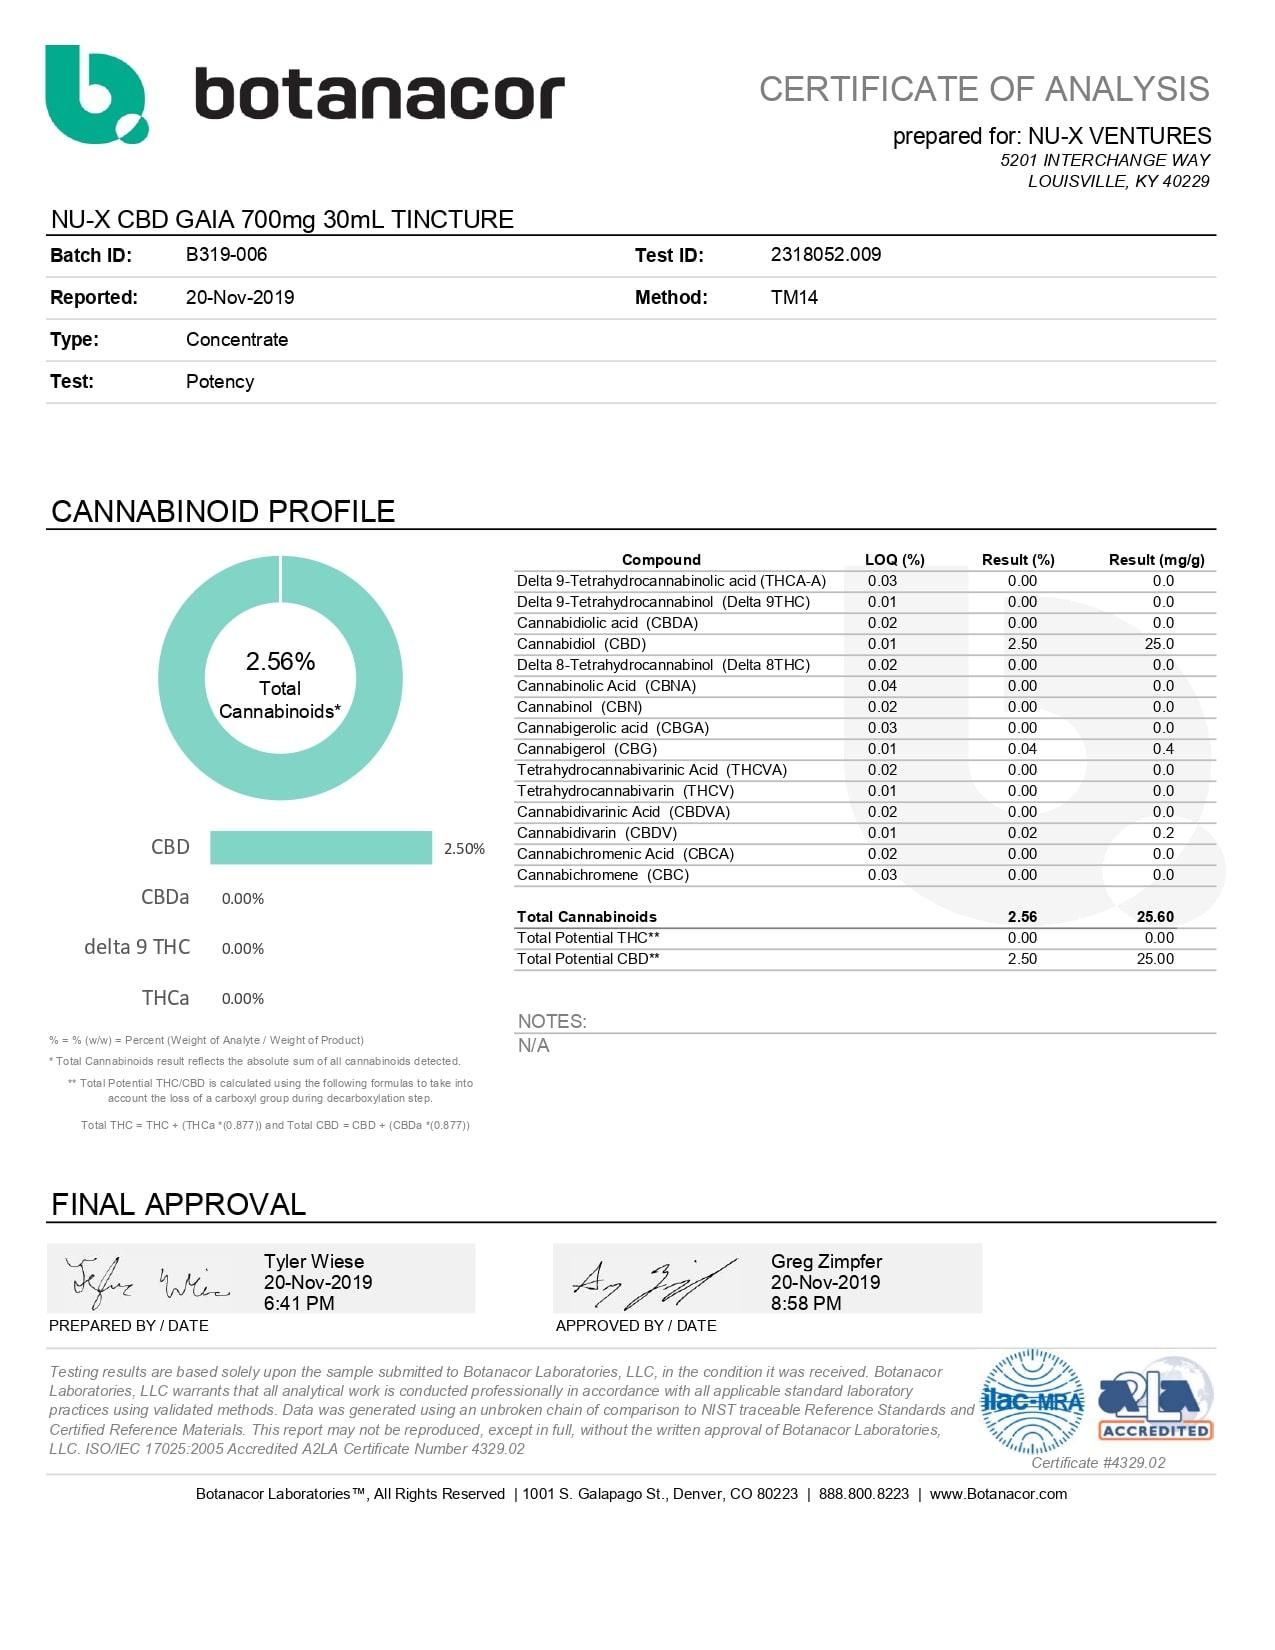 NU-X CBD Tincture Lab Report Gaia Pina Colada Coconut 700mg